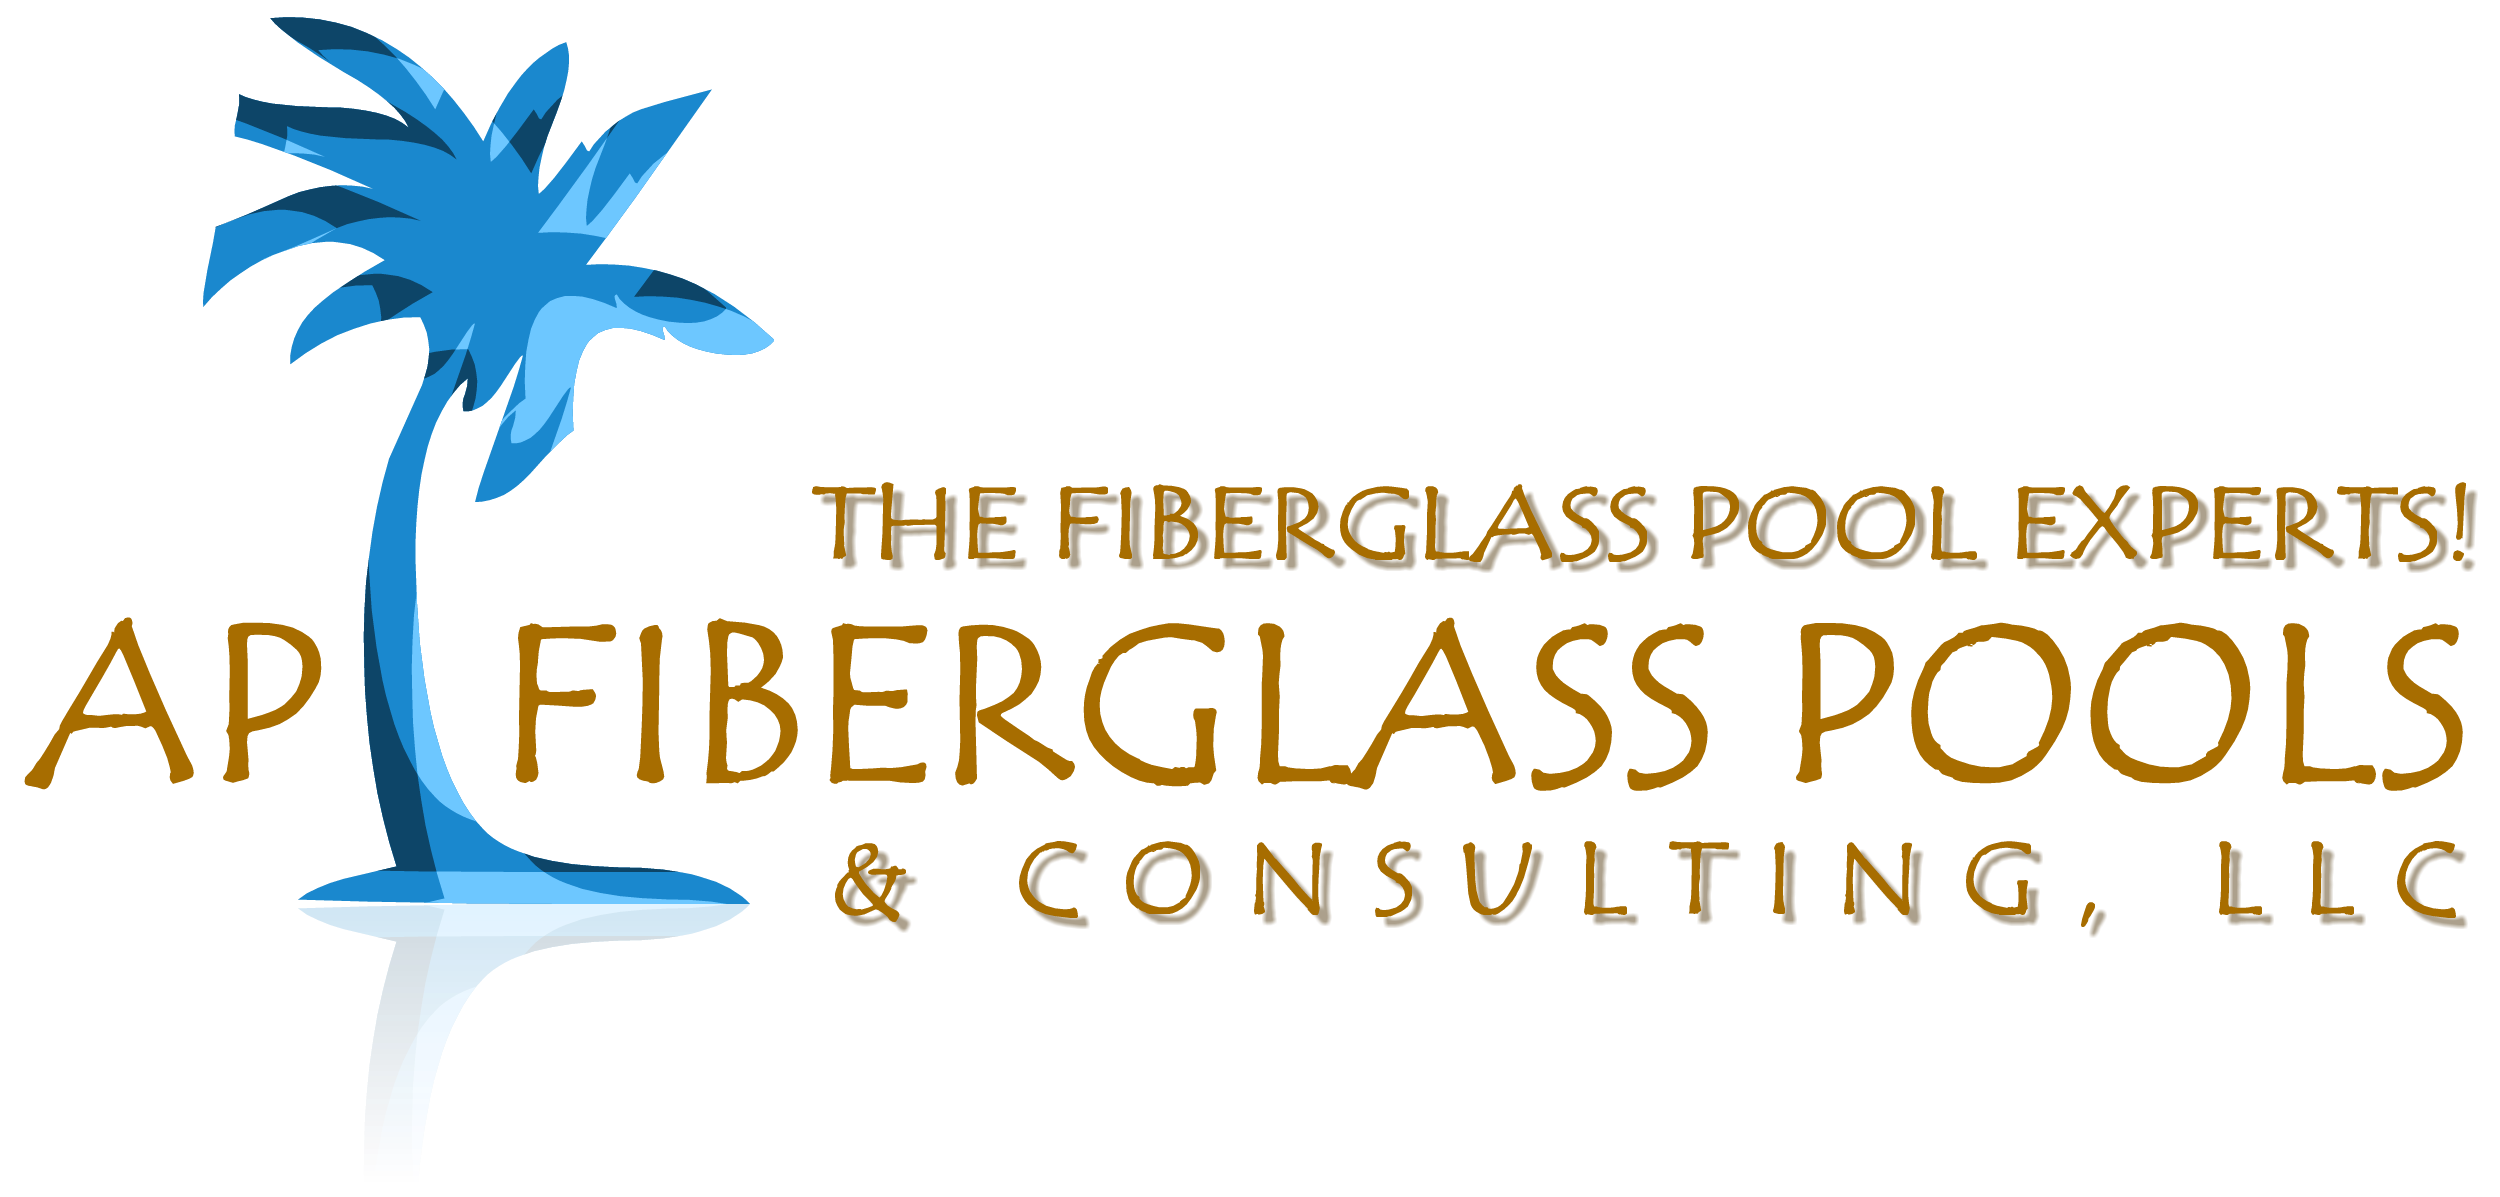 AP Fiberglass Pools